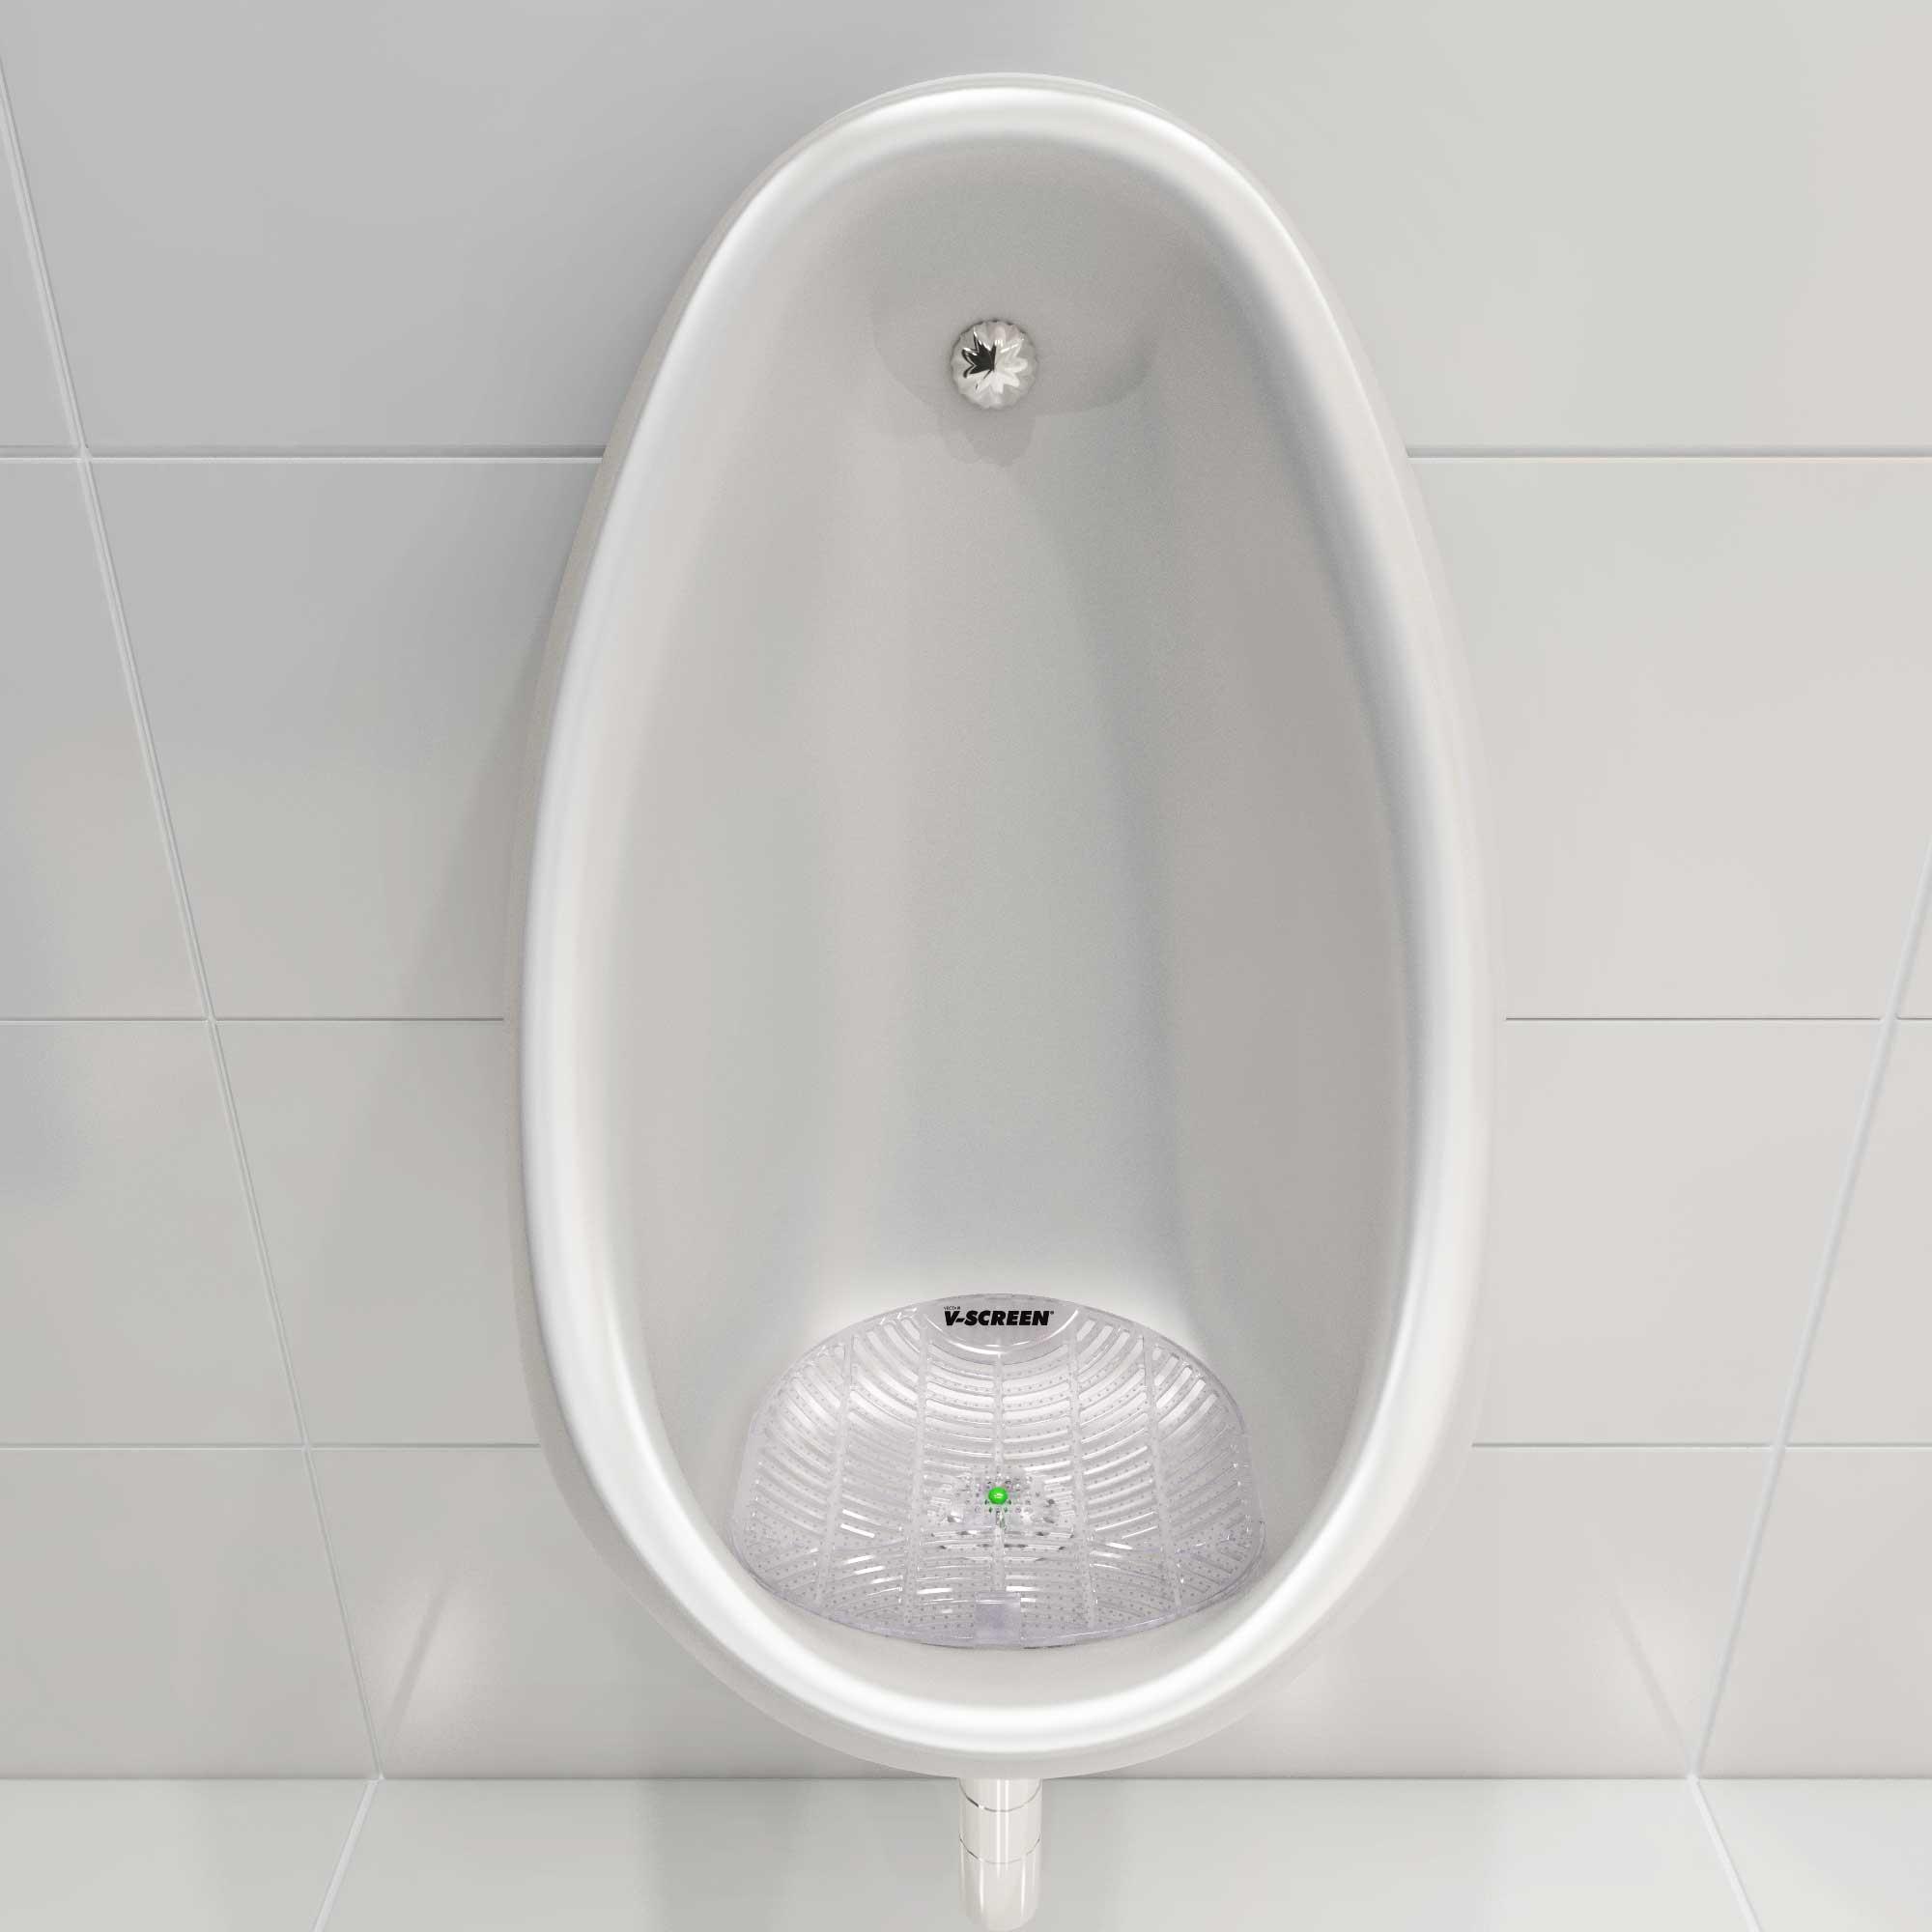 V-Screen® Urinal Screen